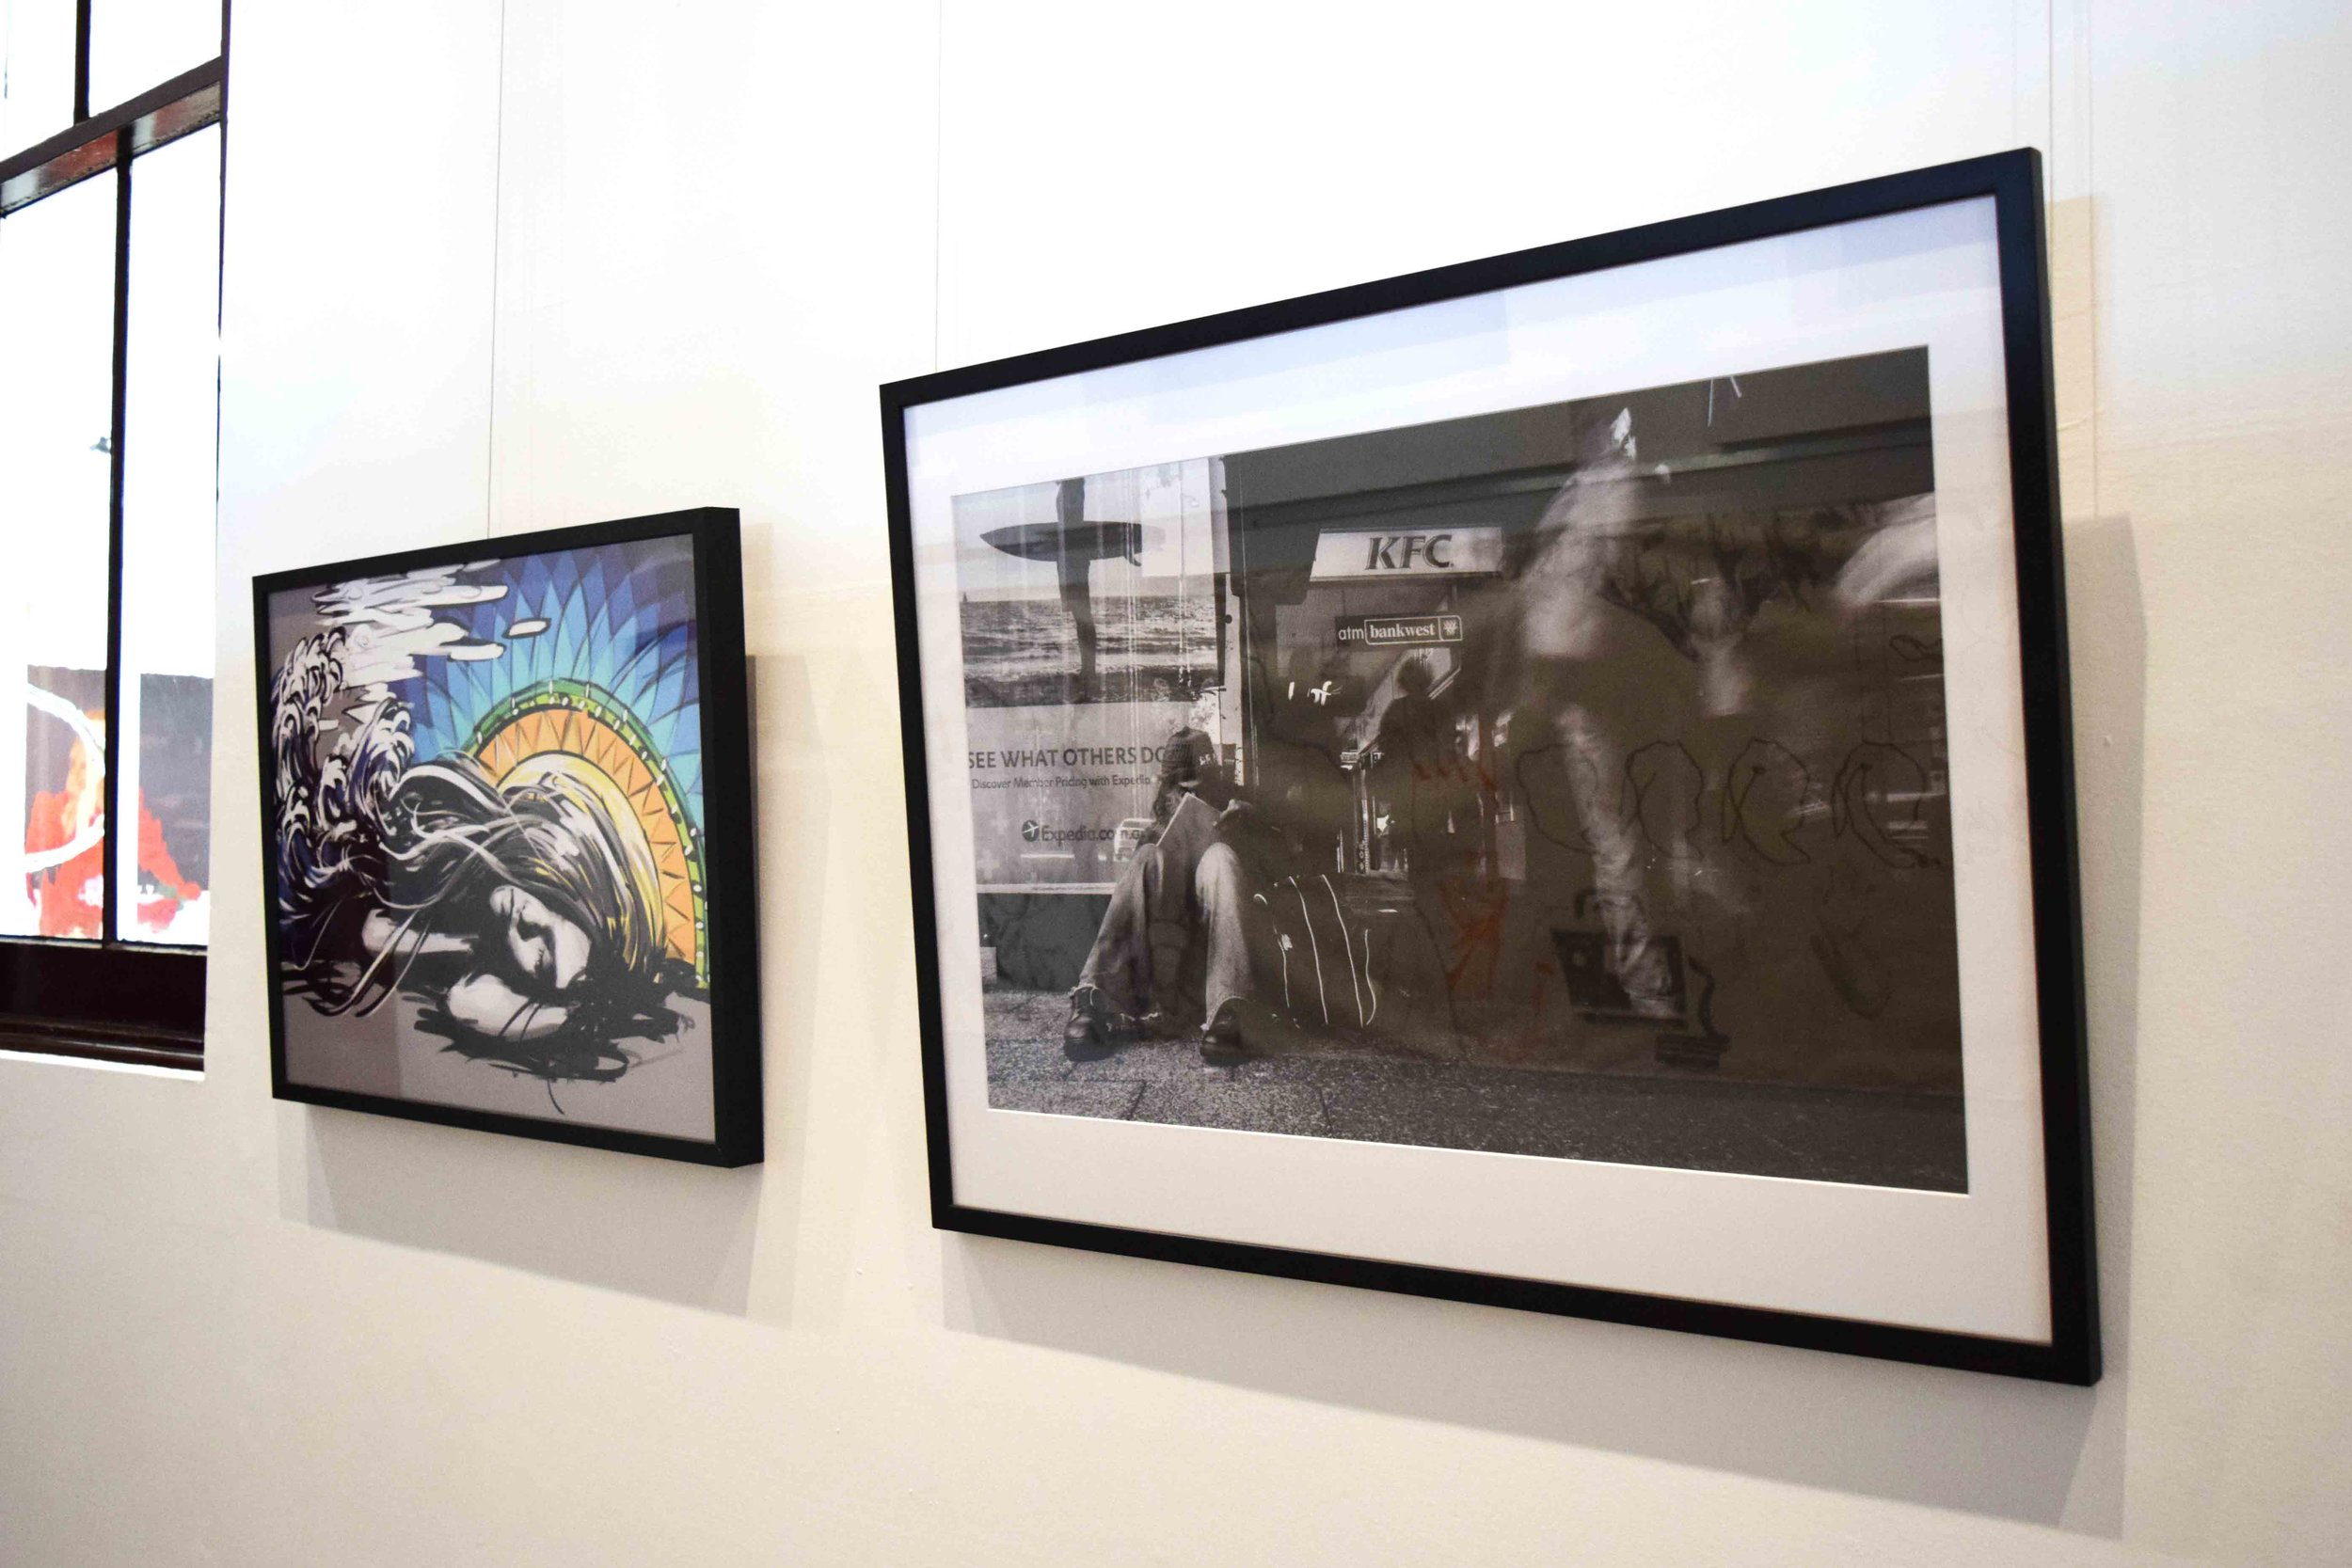 75. Paul No,  Artist Unnoticed , digital photograph, 83 x 62 cm $300   WINNER - PHOTOGRAPHY   74. Manol Ivanov,  Gaia,  digital painting, 60 x 30 cm NFS